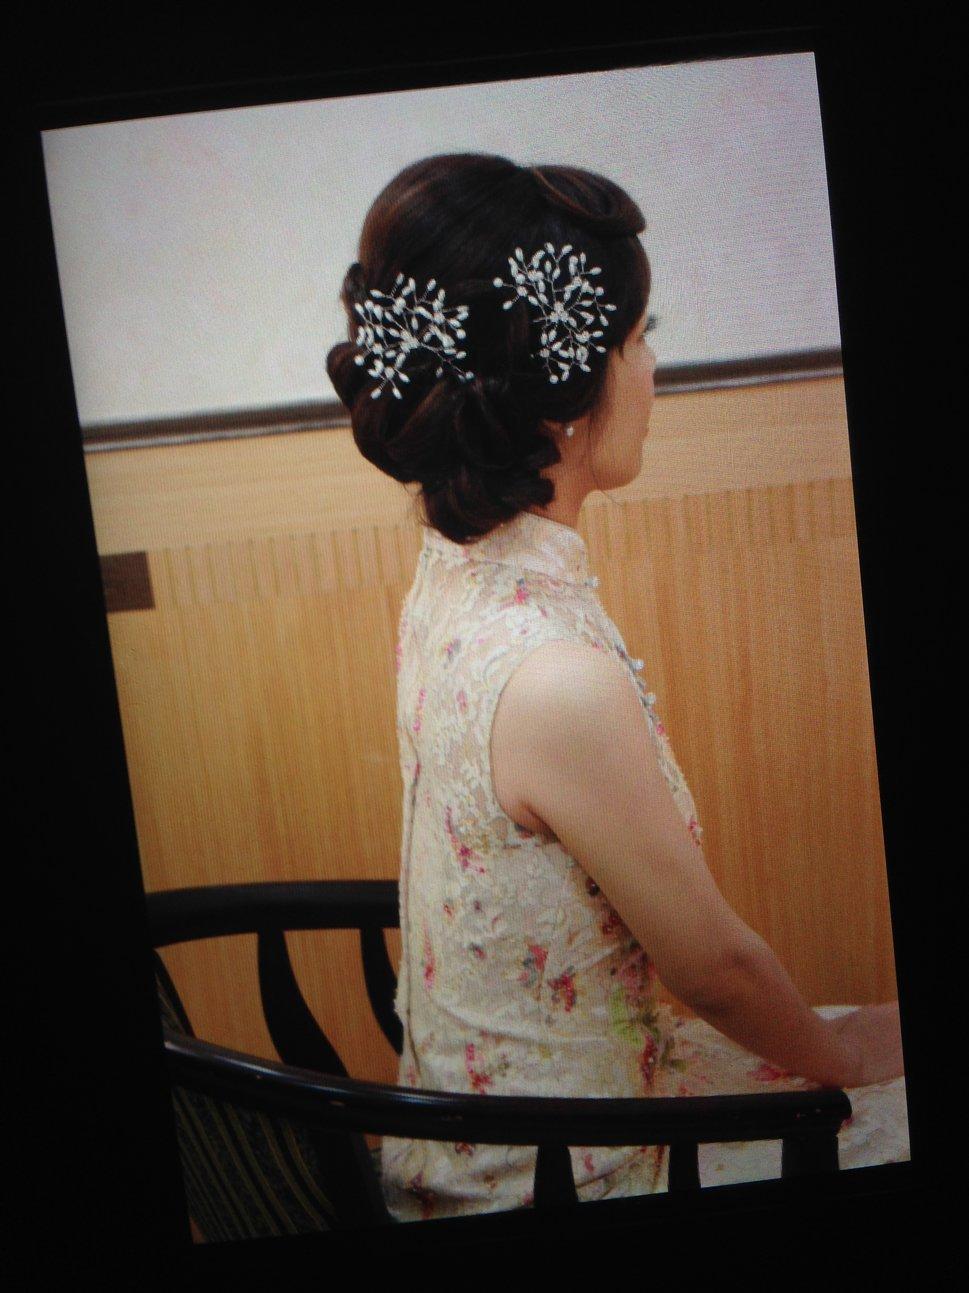 【SUN Studio新娘秘書】婚宴造型 MIAW(編號:428281) - SUN Studio-珊珊 新娘秘書 - 結婚吧一站式婚禮服務平台